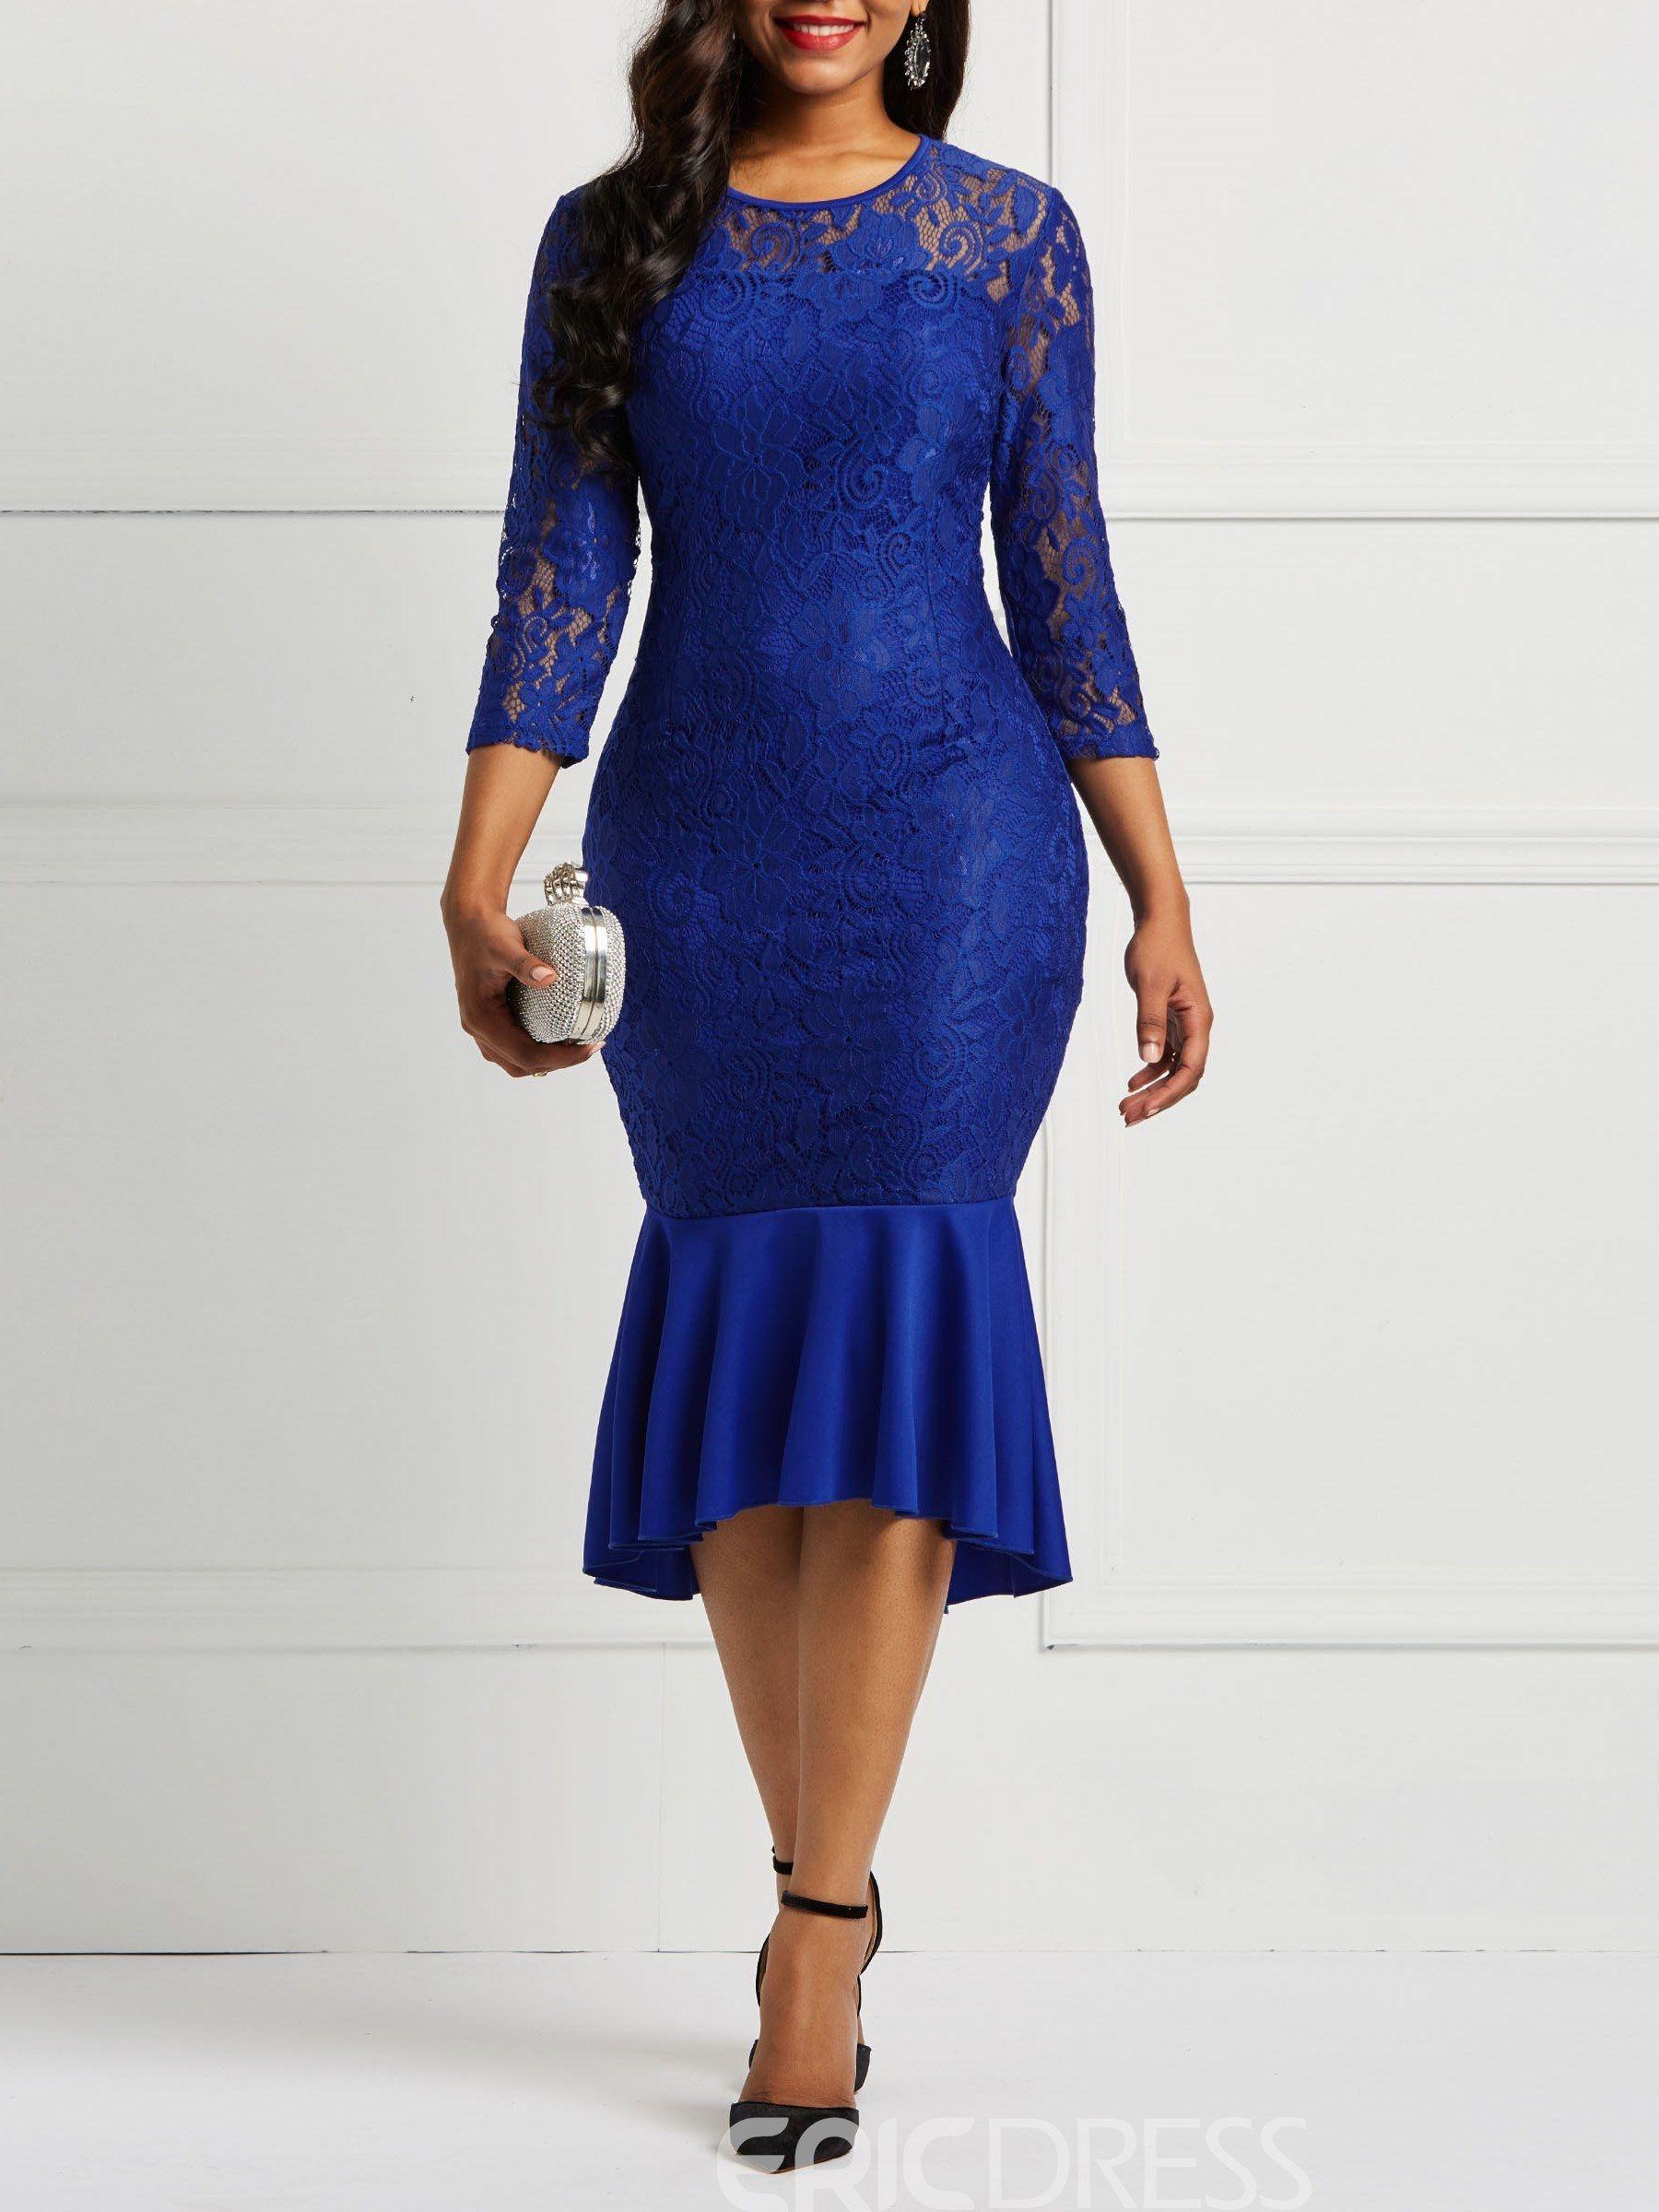 8b756166b ericdress sirena manga larga encaje vestido de mujer | ROPA Y ...